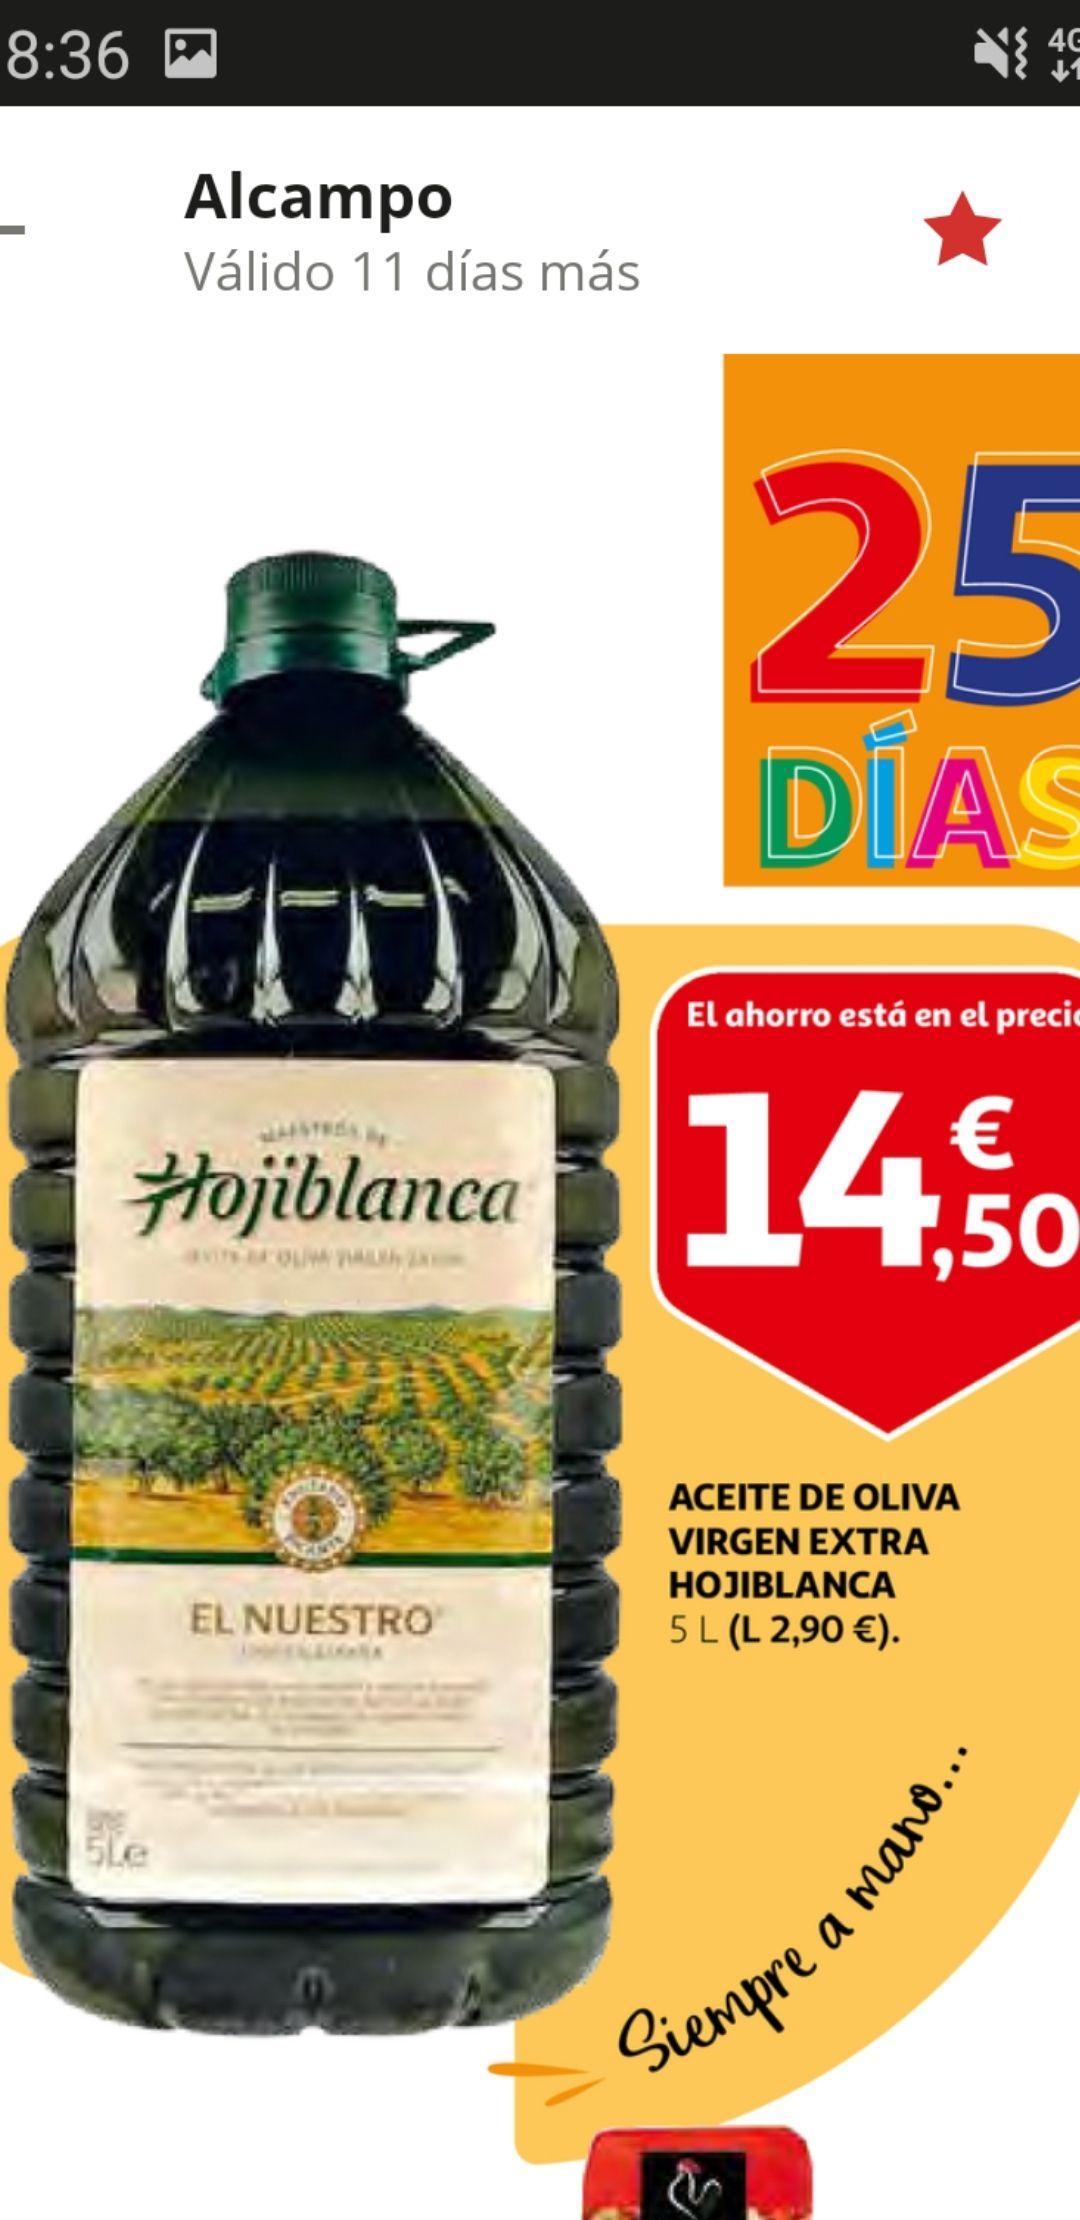 Aceite de oliva virgen extra HOJIBLANCA garrafa de 5 l.